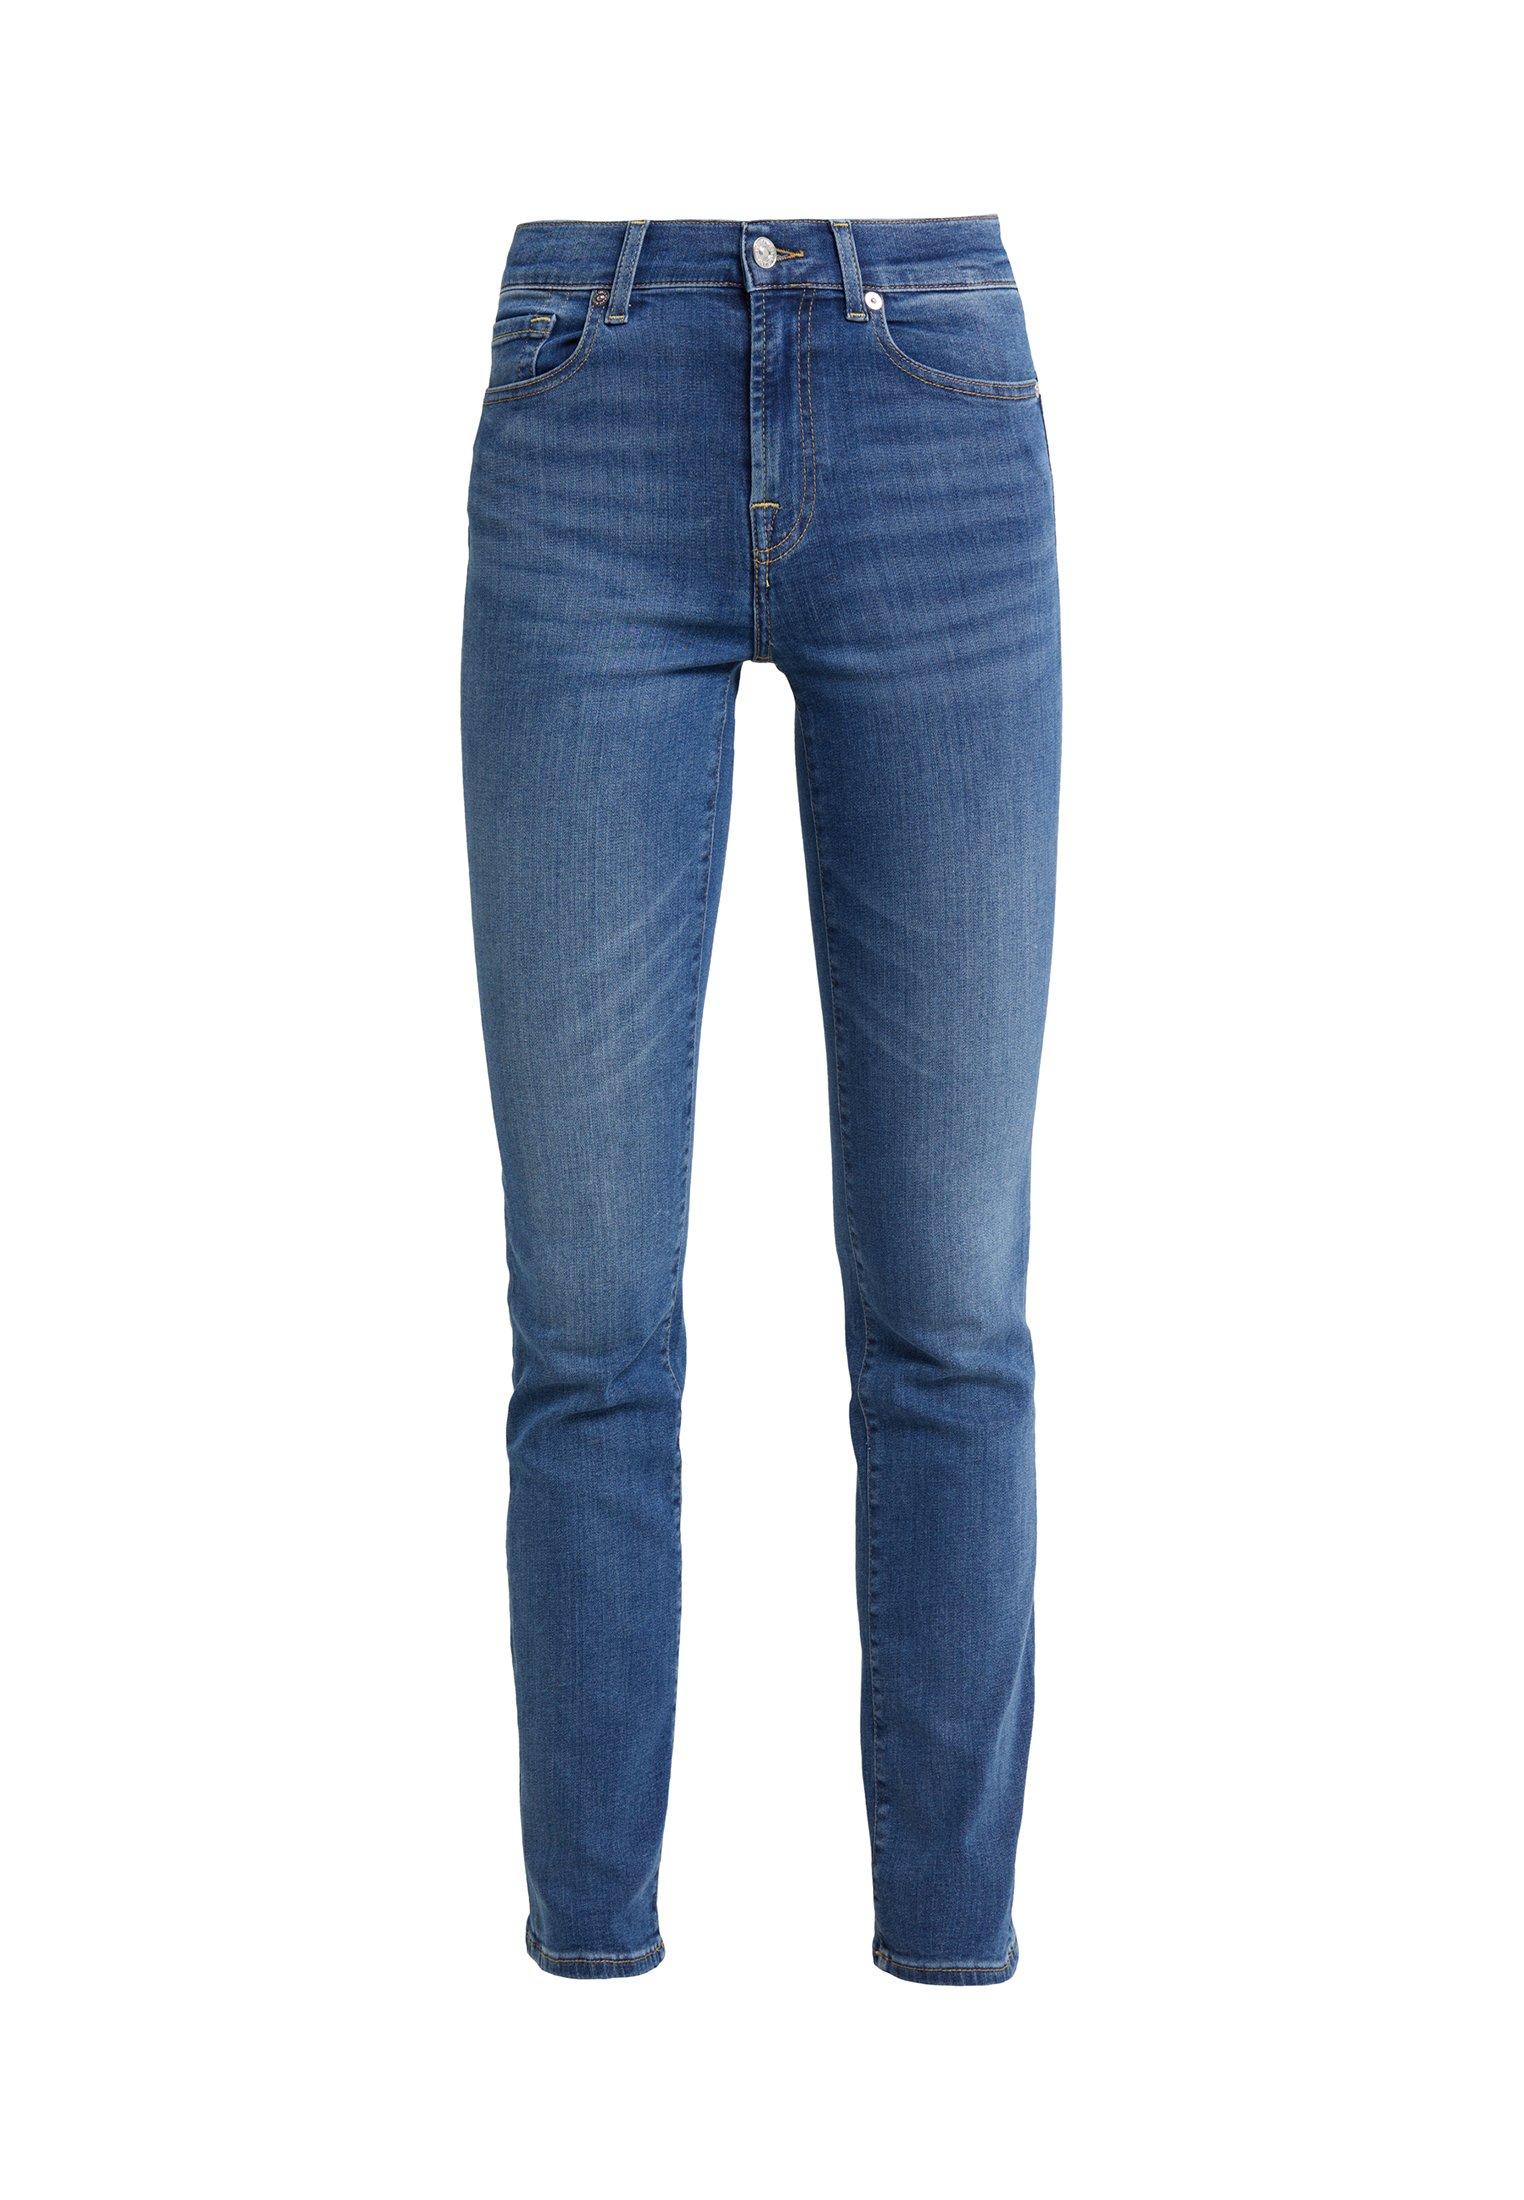 7 For All Mankind Jeans A Sigaretta - Bair Vintage Dusk rDLfd